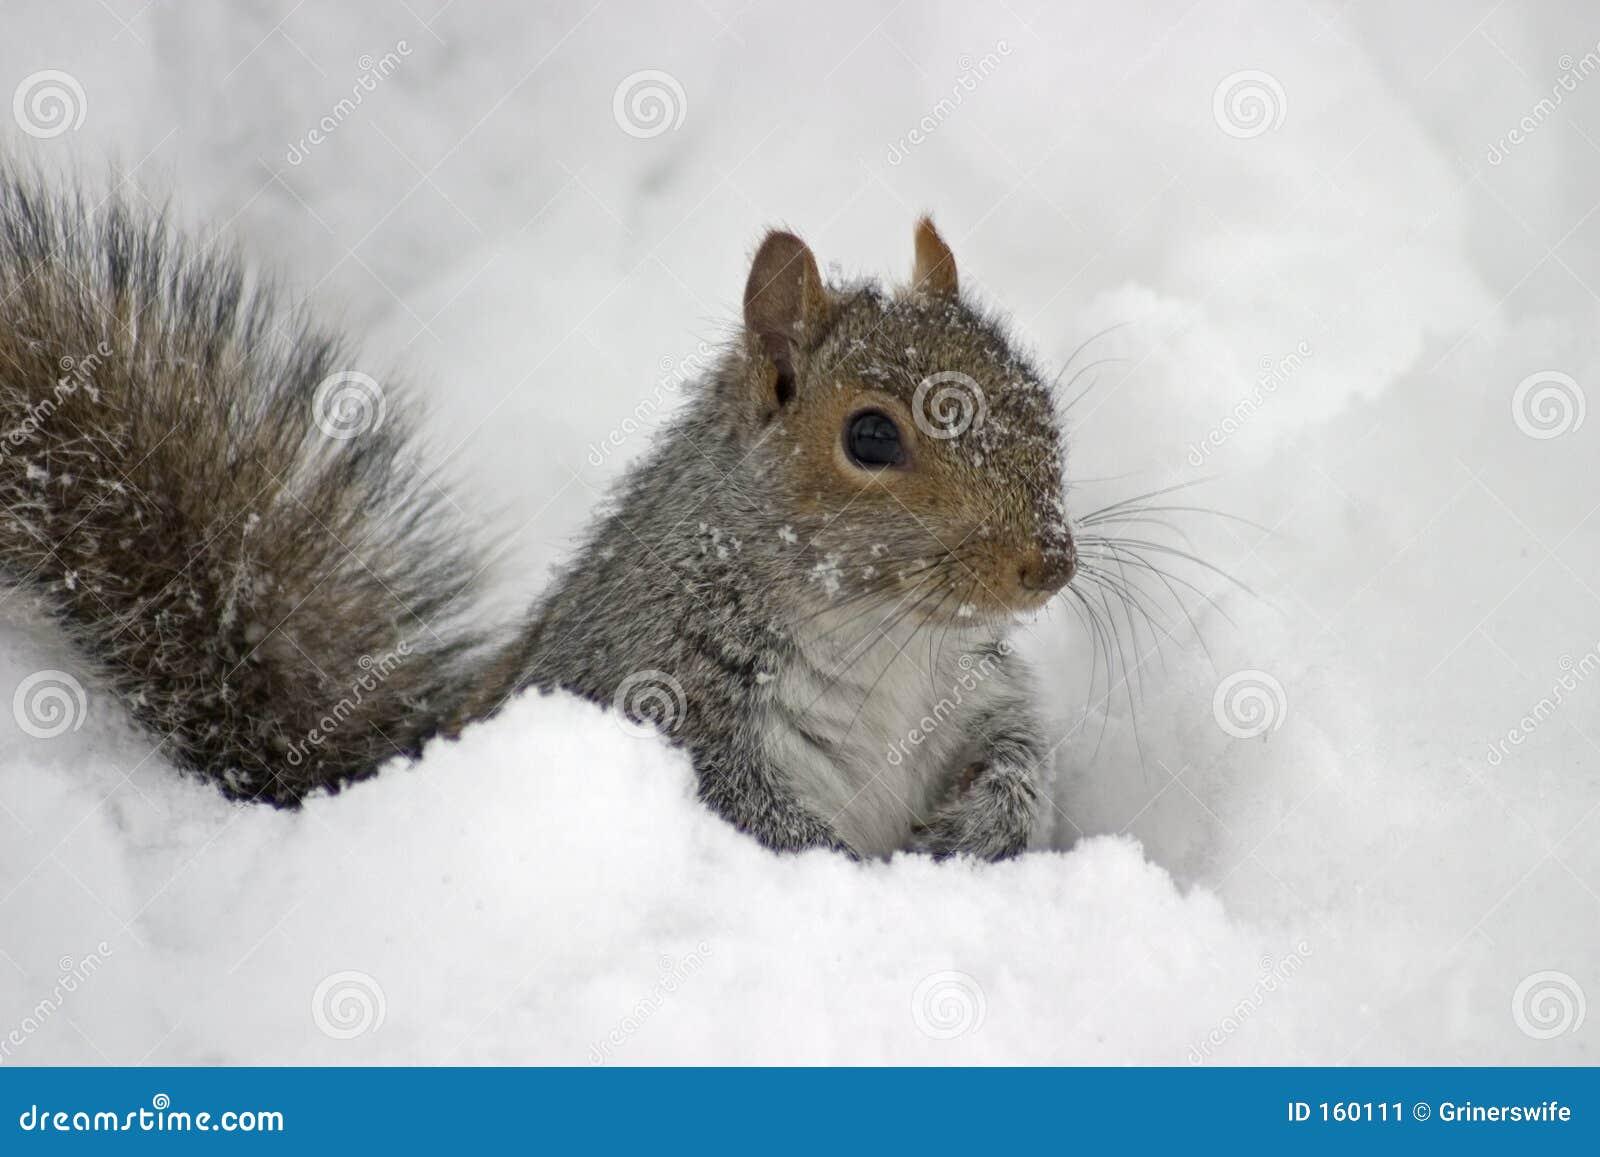 Cold Squirrel